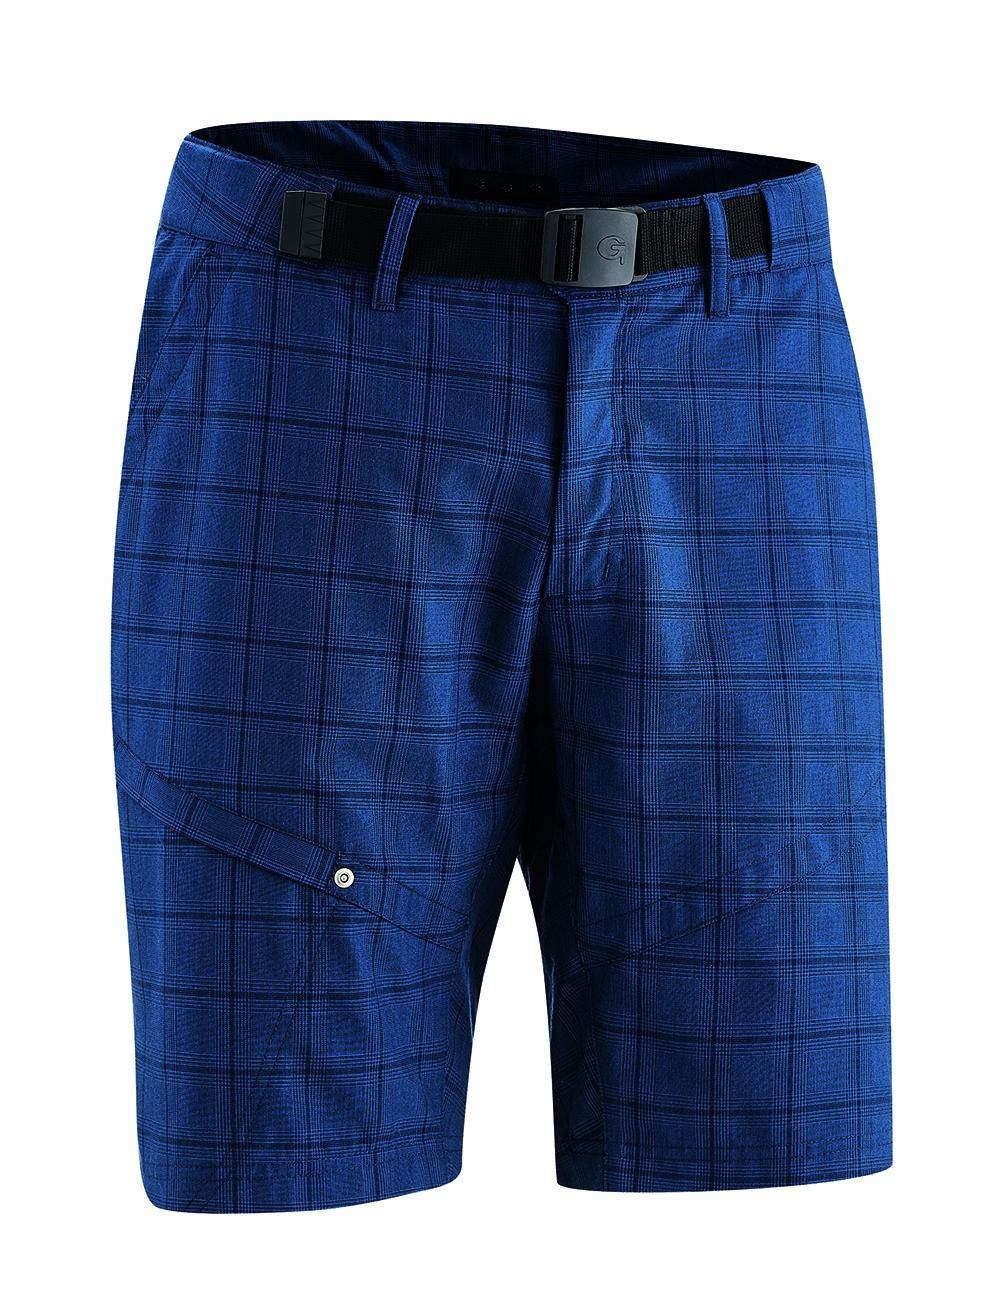 Gonso Herren He-Bike-Shorts 62200 dunkelblau